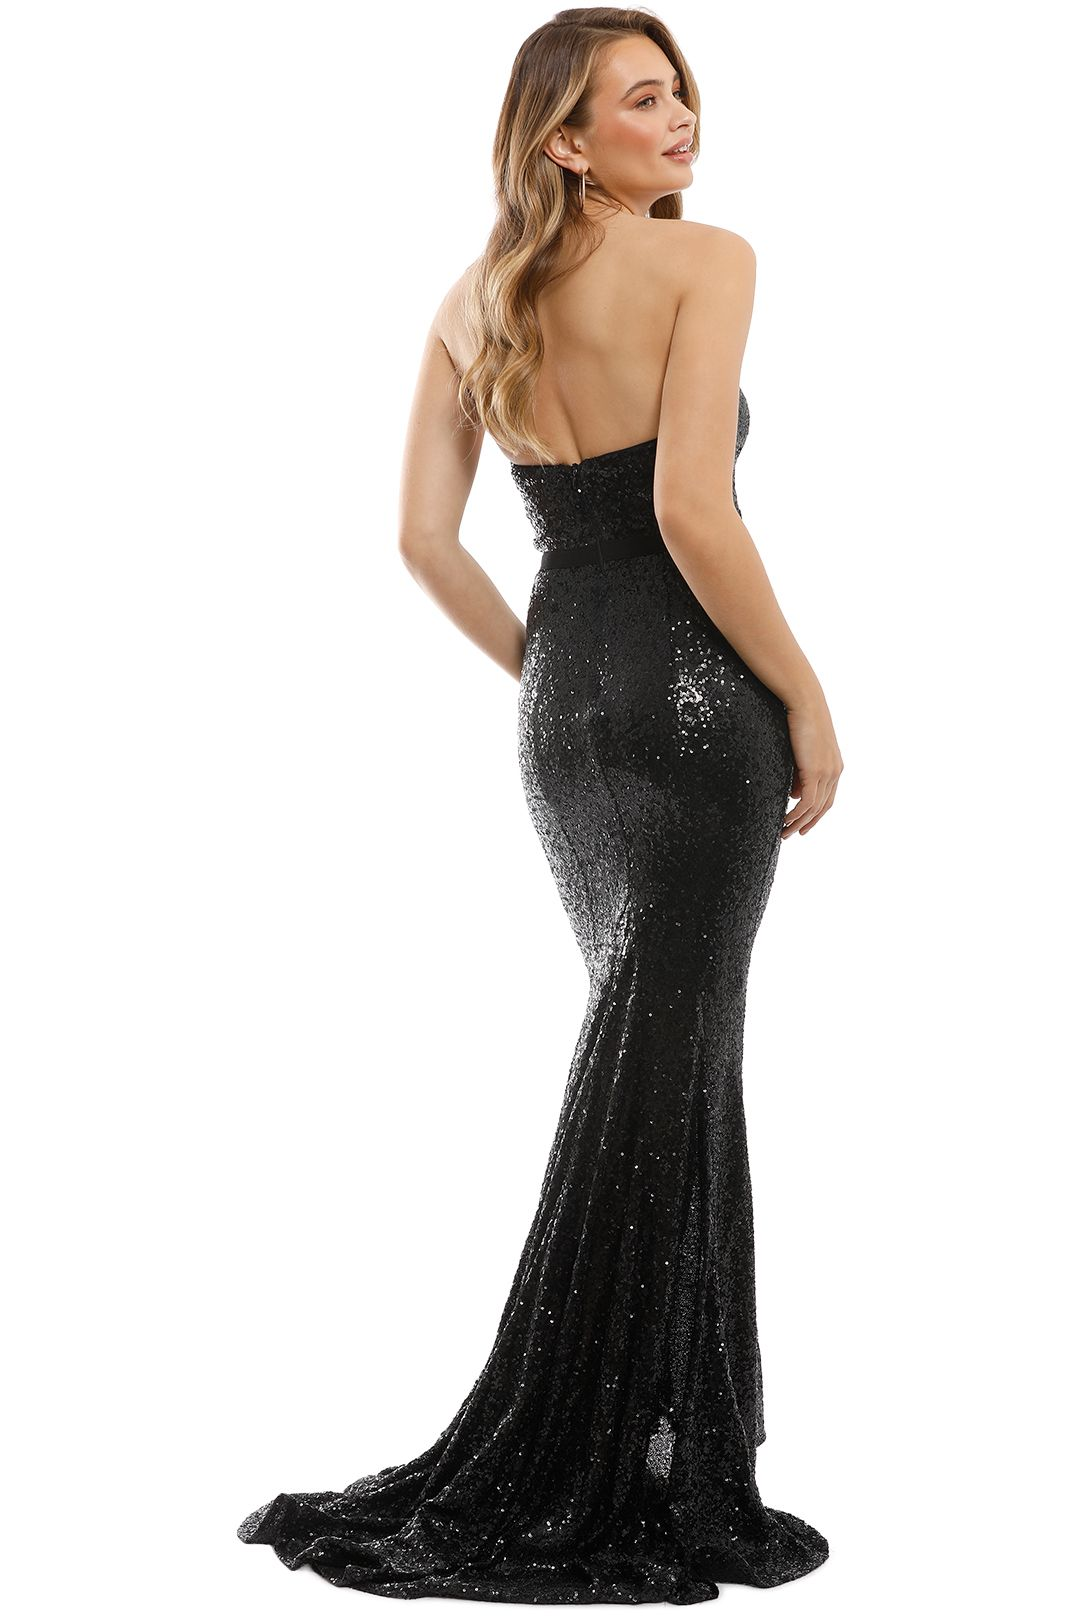 Elle Zeitoune - Cheyna Black Gown - Back